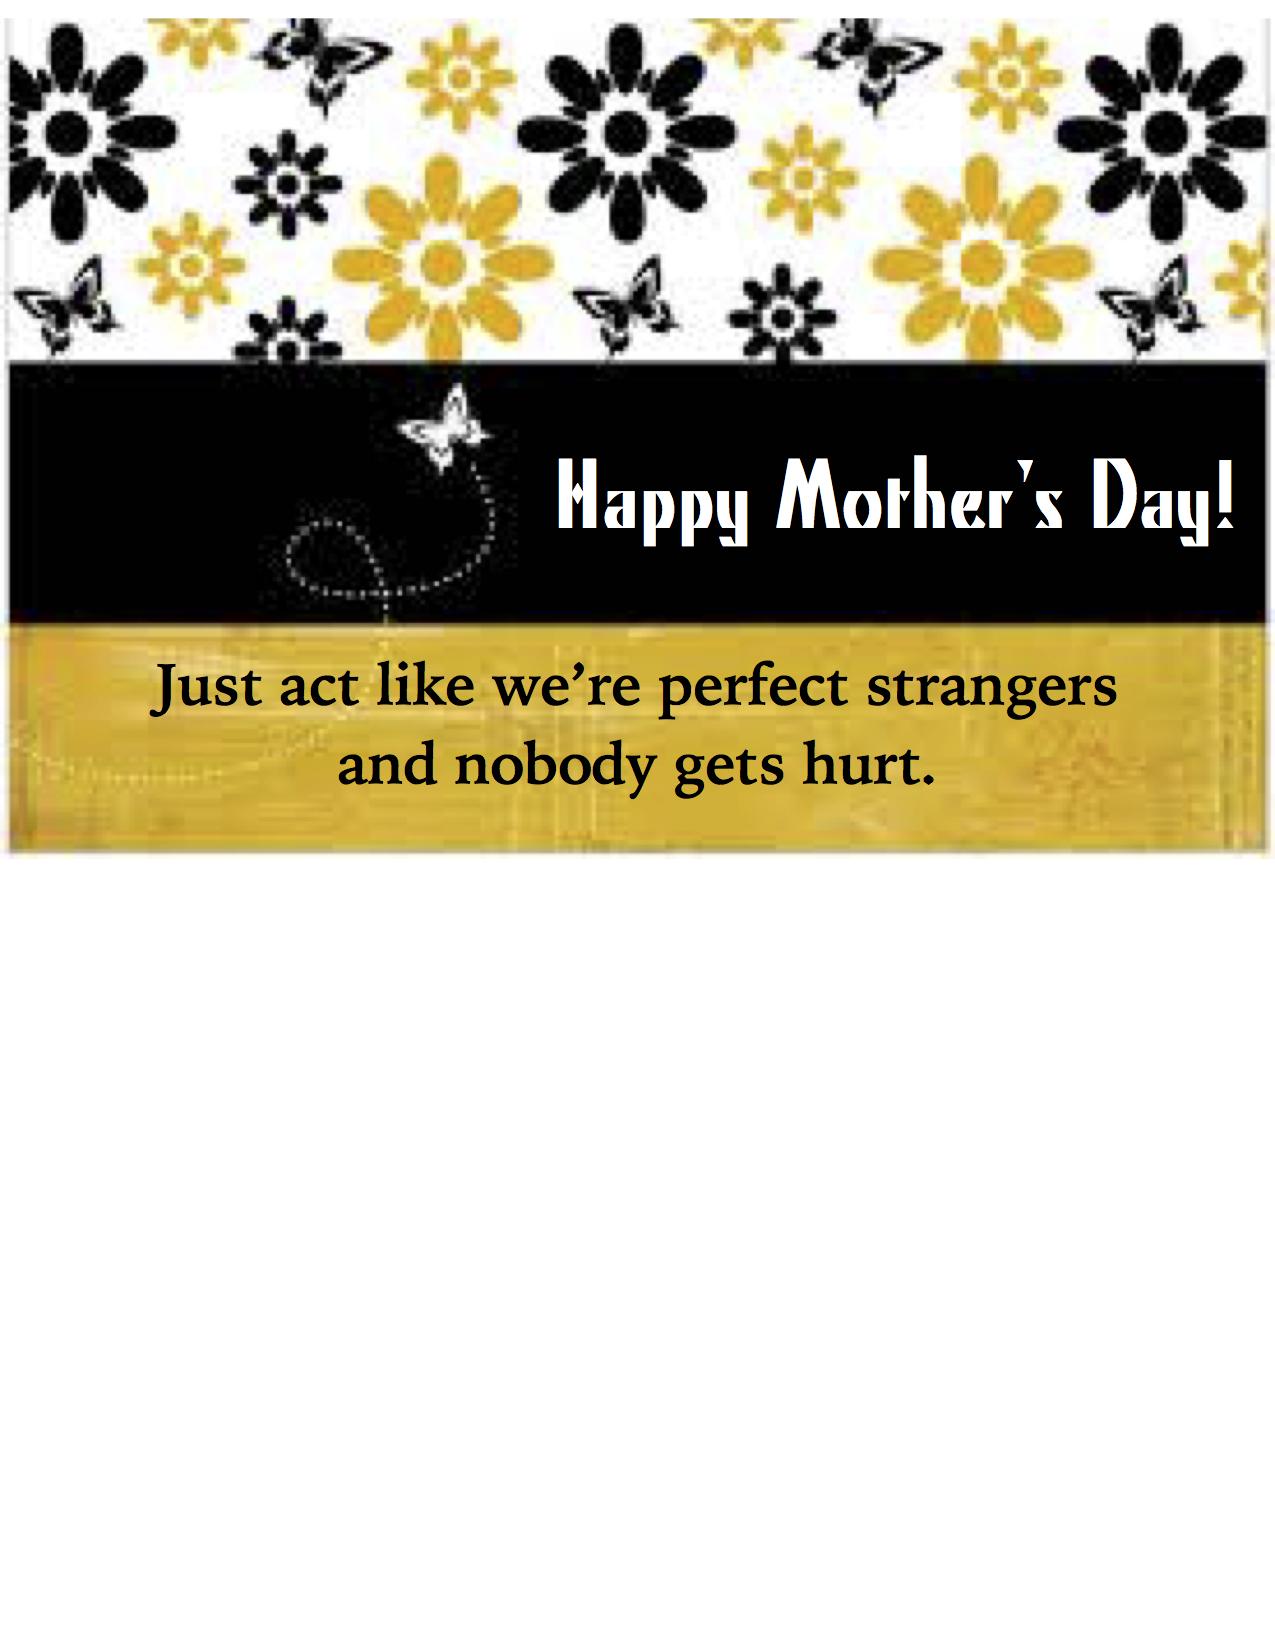 MothersDay6.jpg